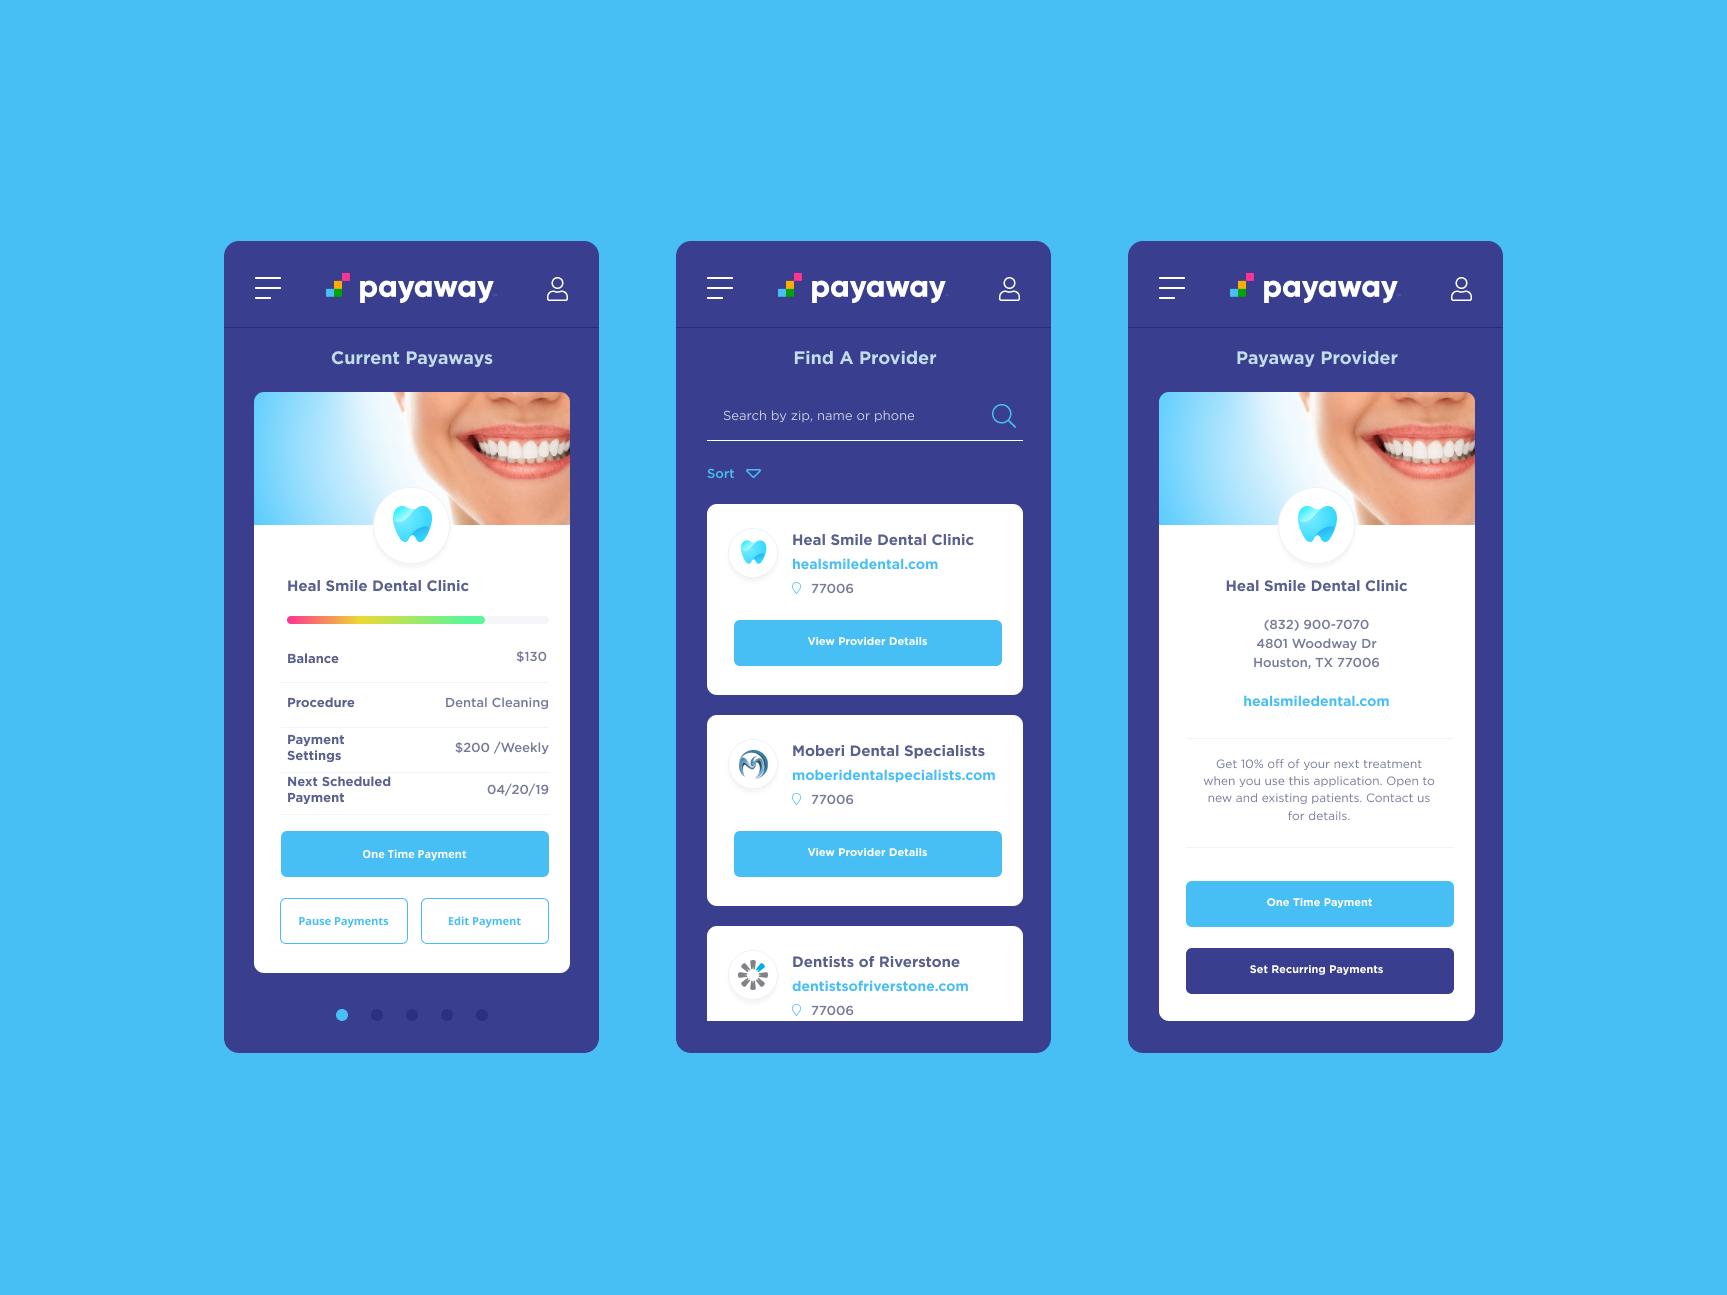 Paywayscreens